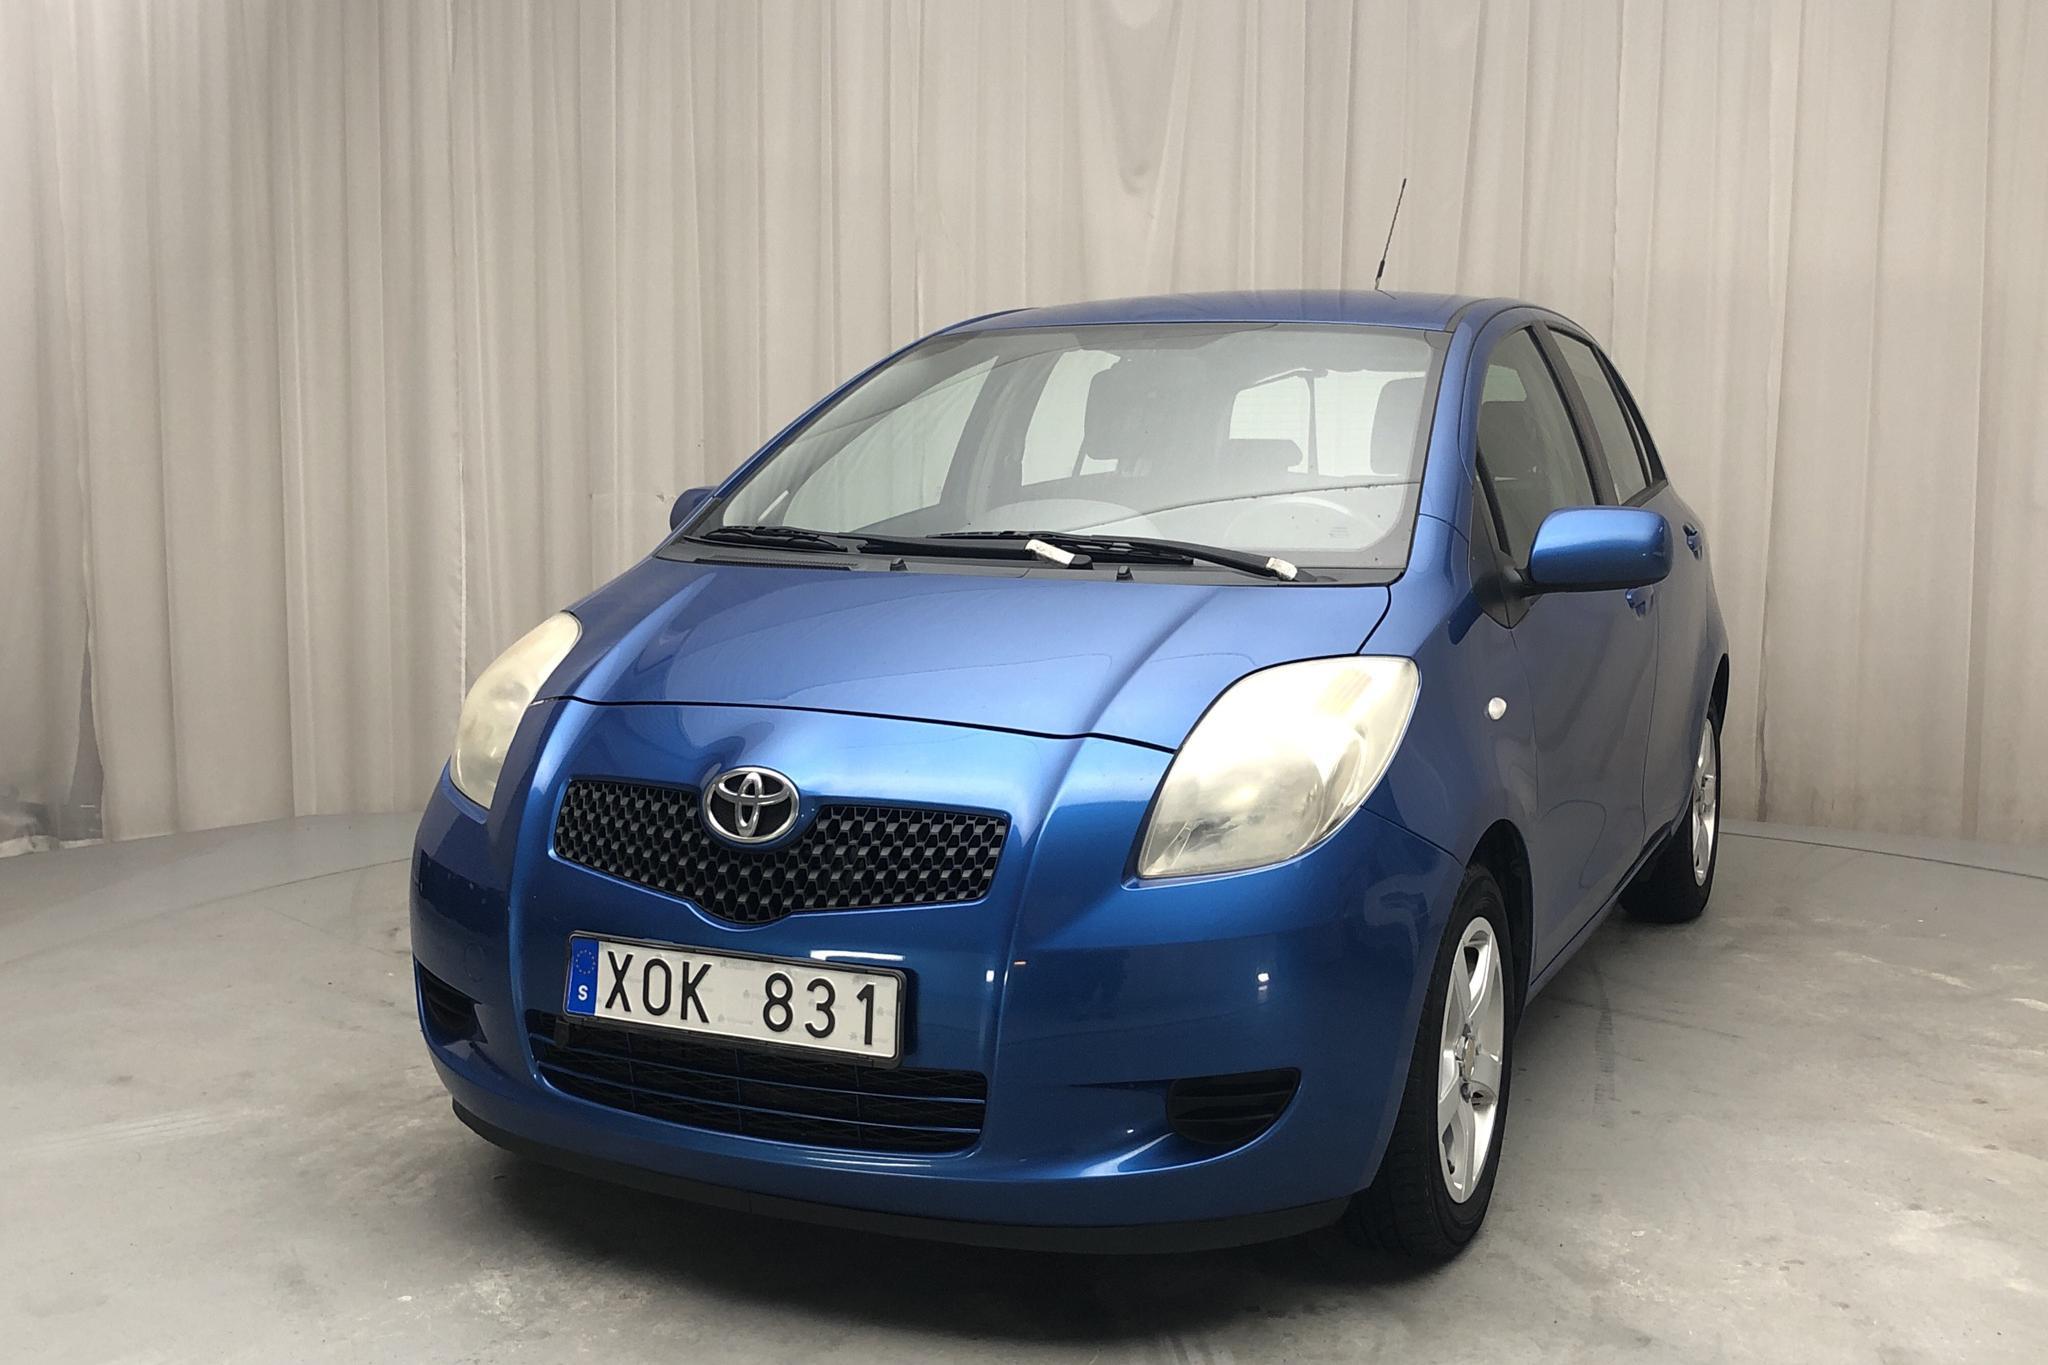 Toyota Yaris 1.3 5dr (87hk) - 174 170 km - Manual - blue - 2006